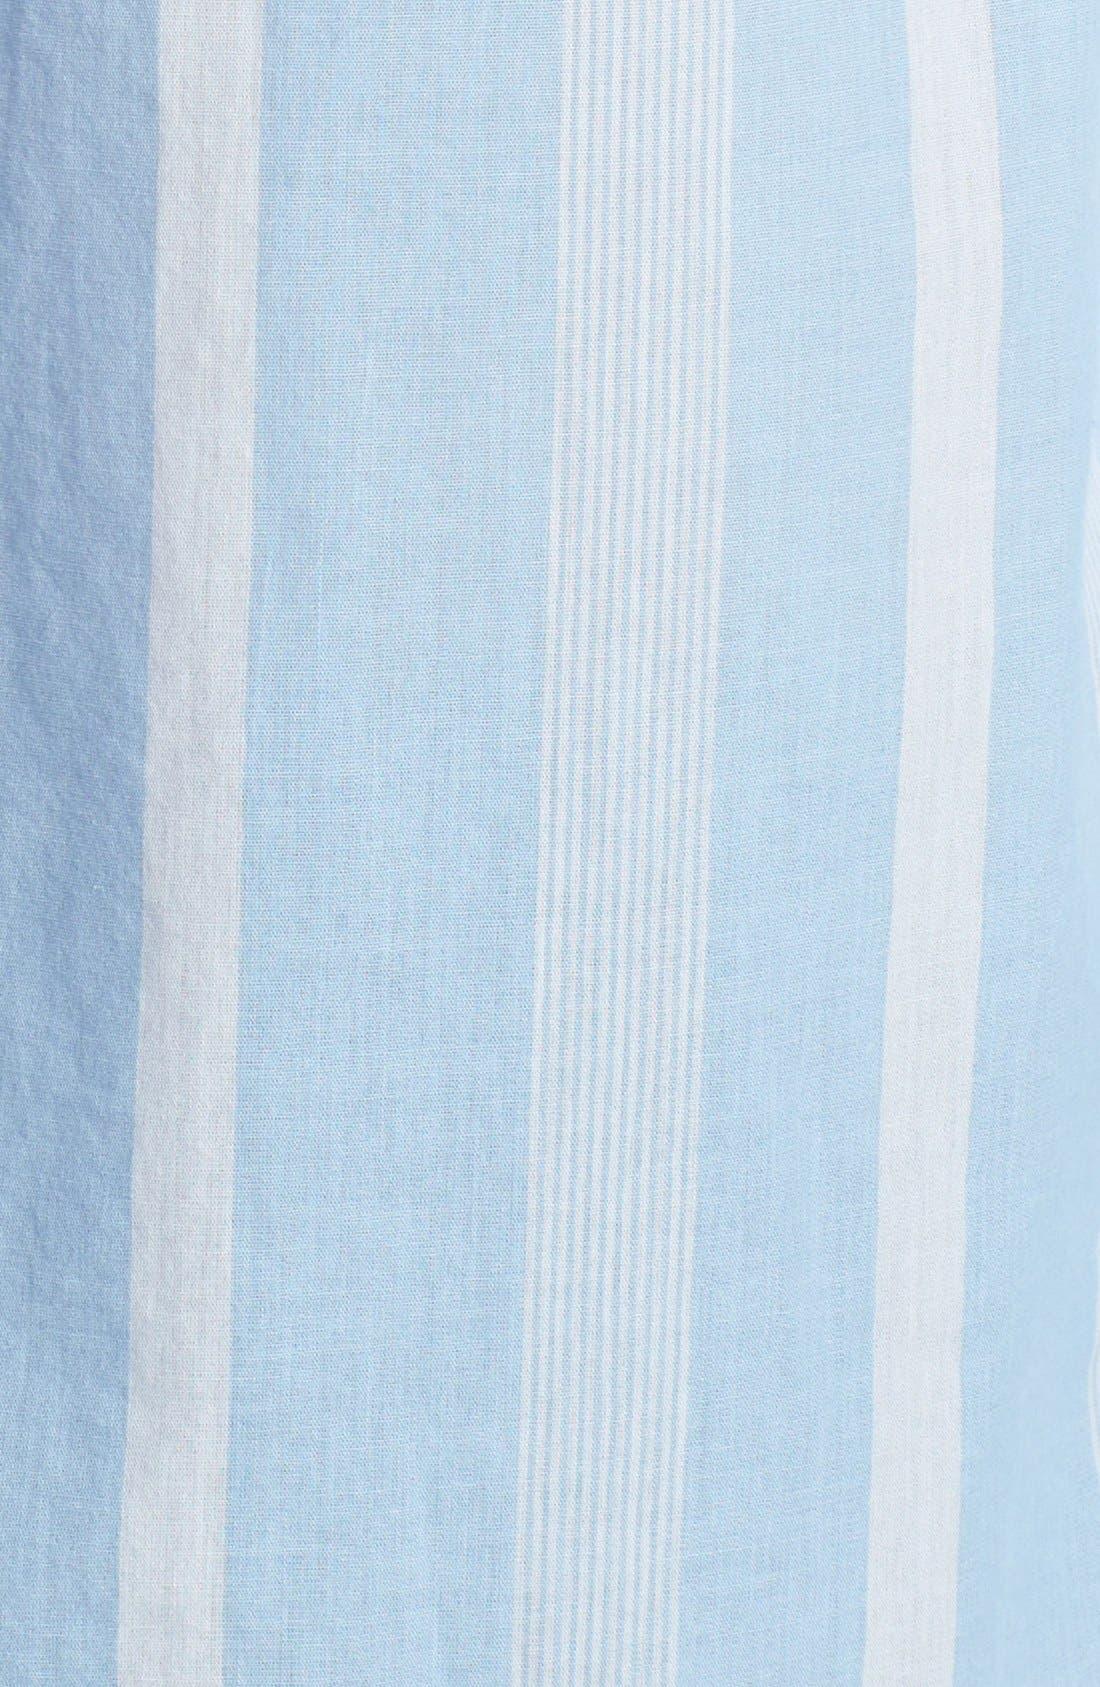 Alternate Image 3  - Equipment 'Margaux' Stripe Cotton Shirt